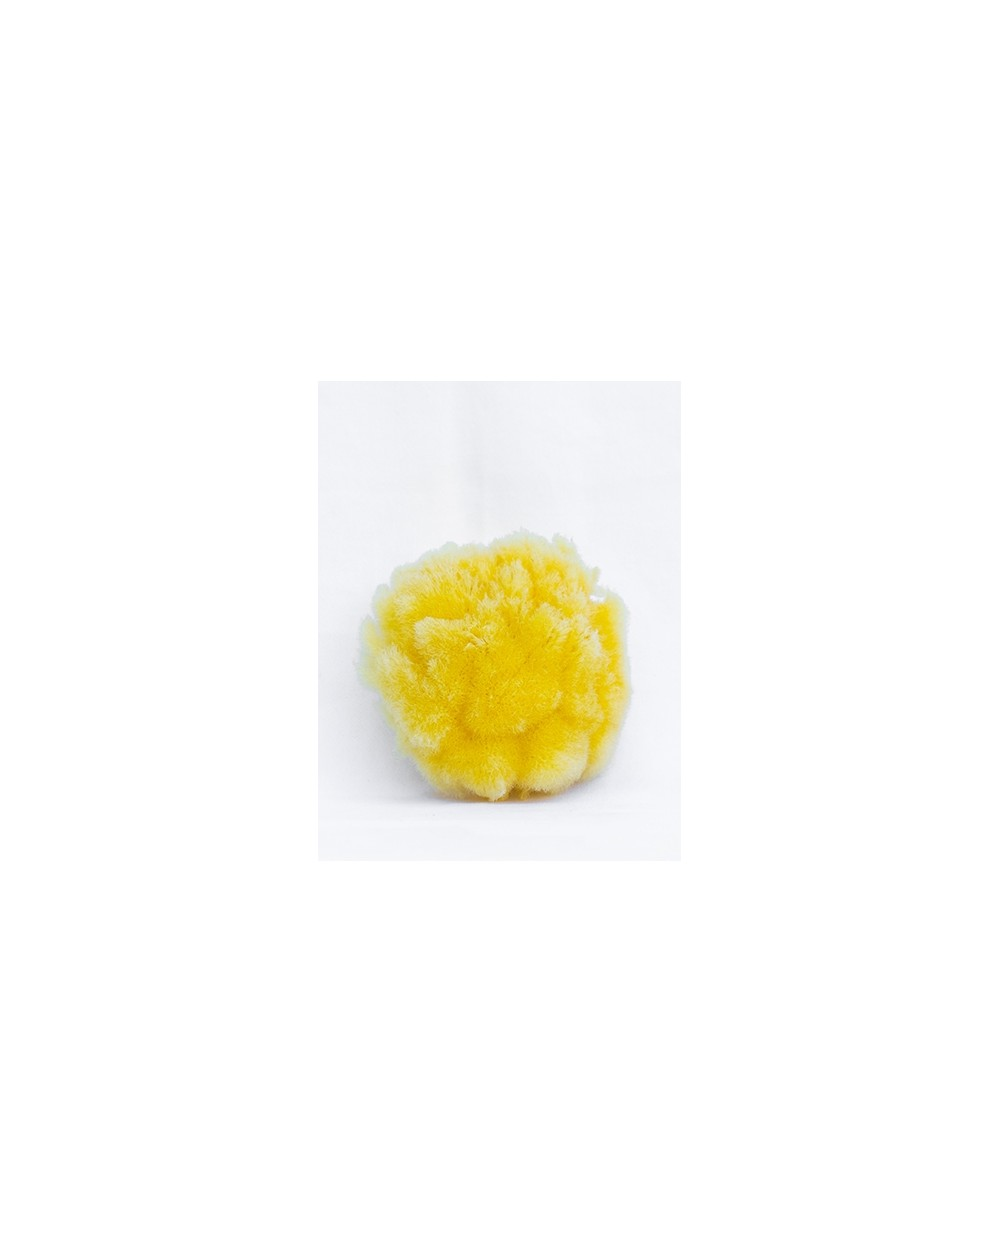 10 cm Natural Mediterranean Sea Sponge ZIMOCA (processed) Siciliana.lt